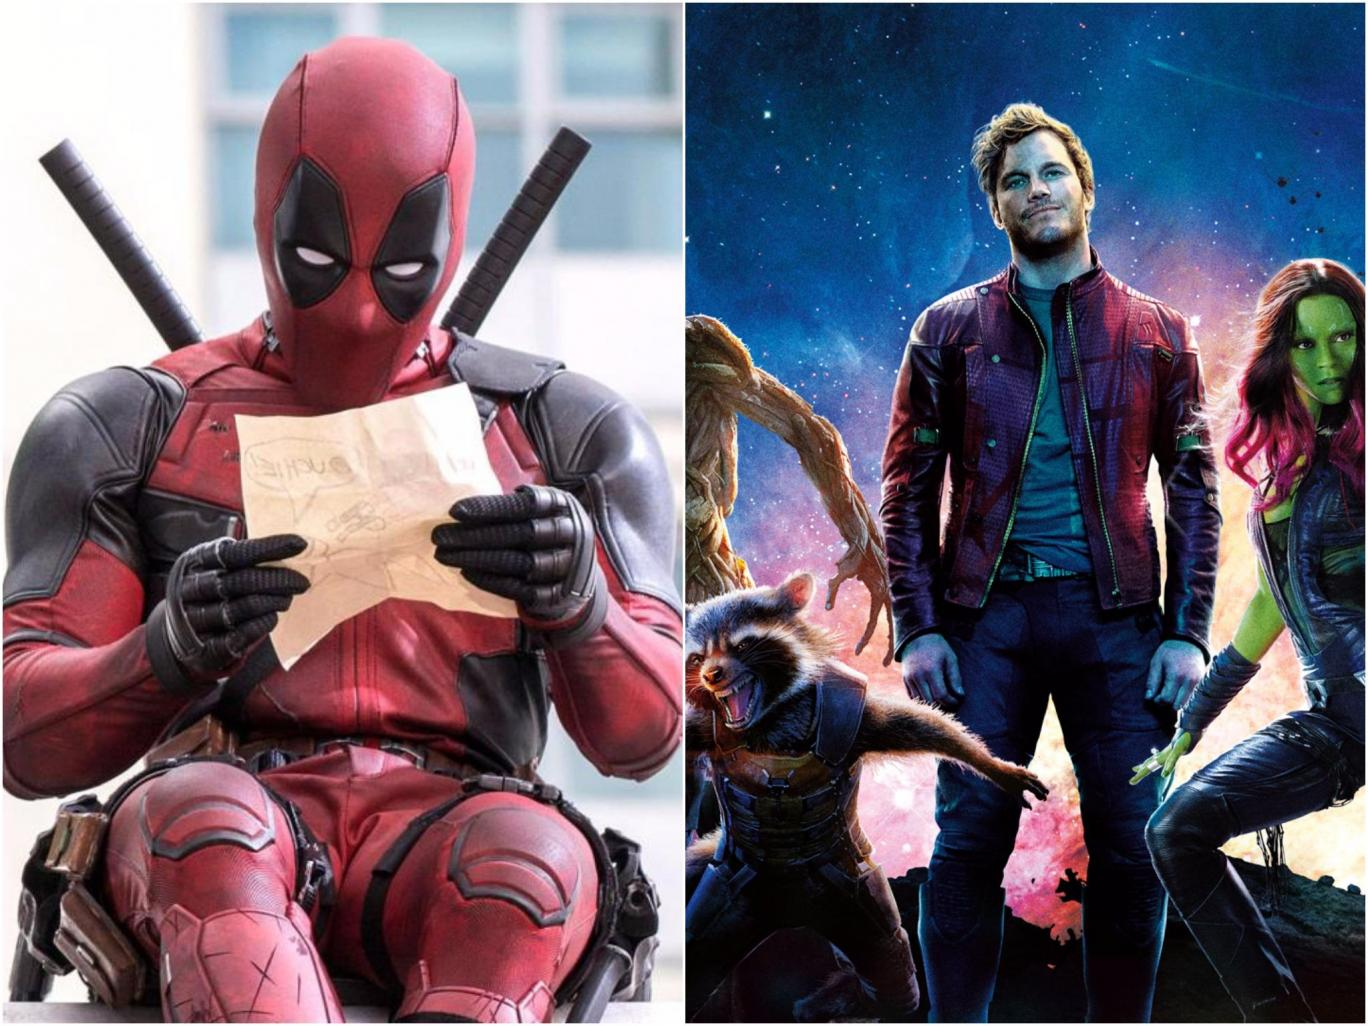 Deadpool: actors and roles, box office, reaction of critics